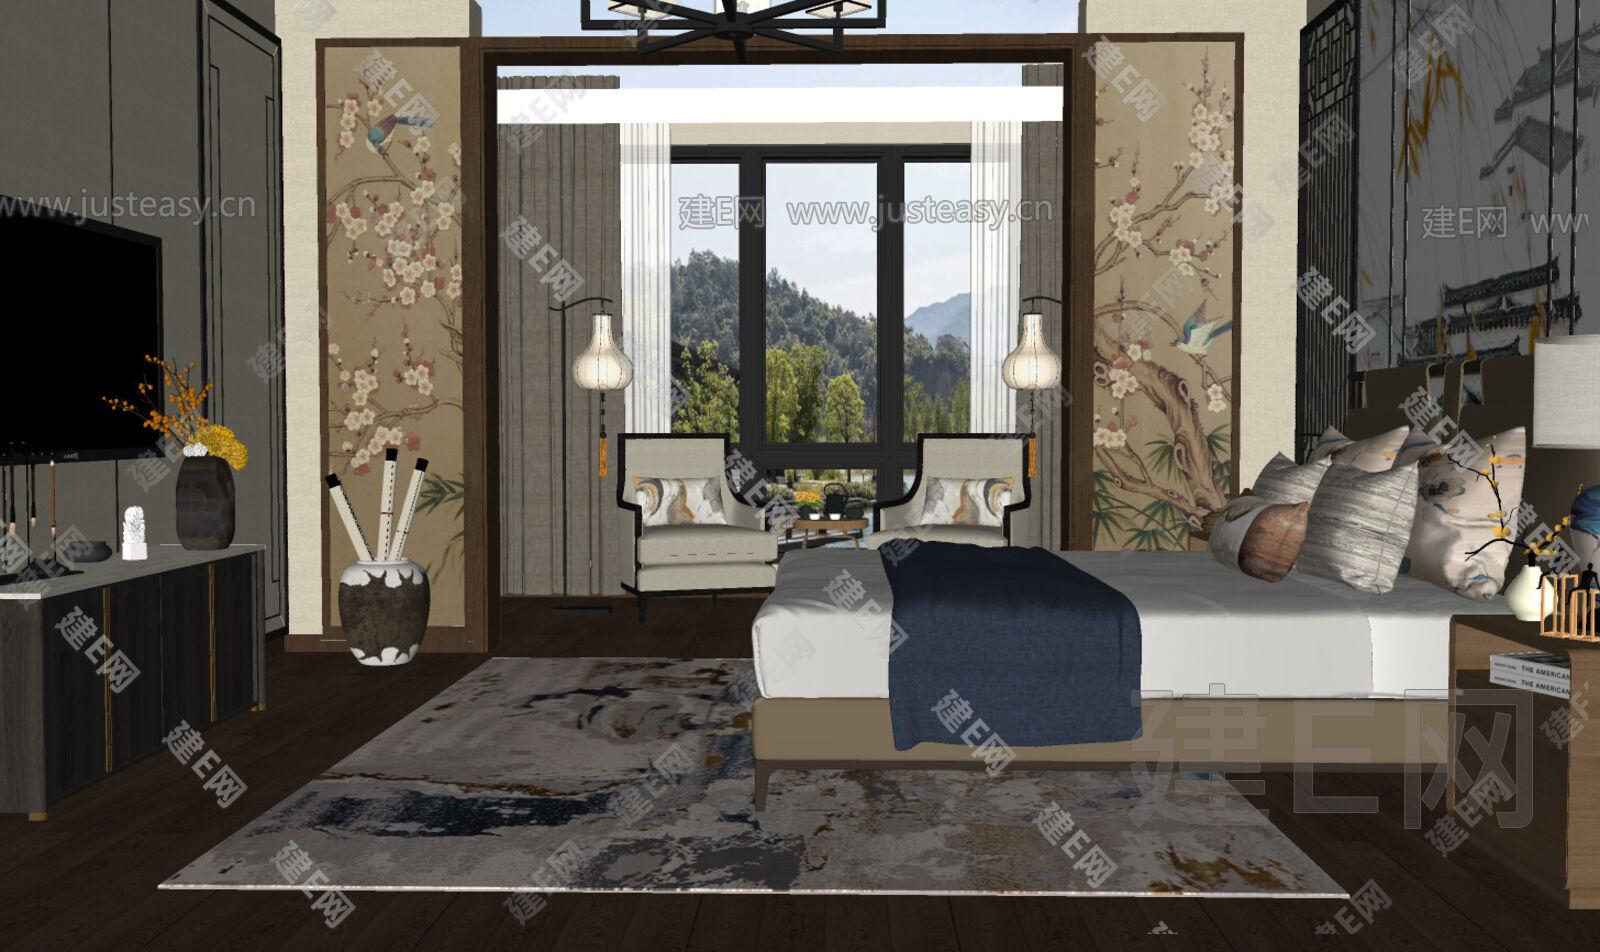 新中式卧室sketchup模型